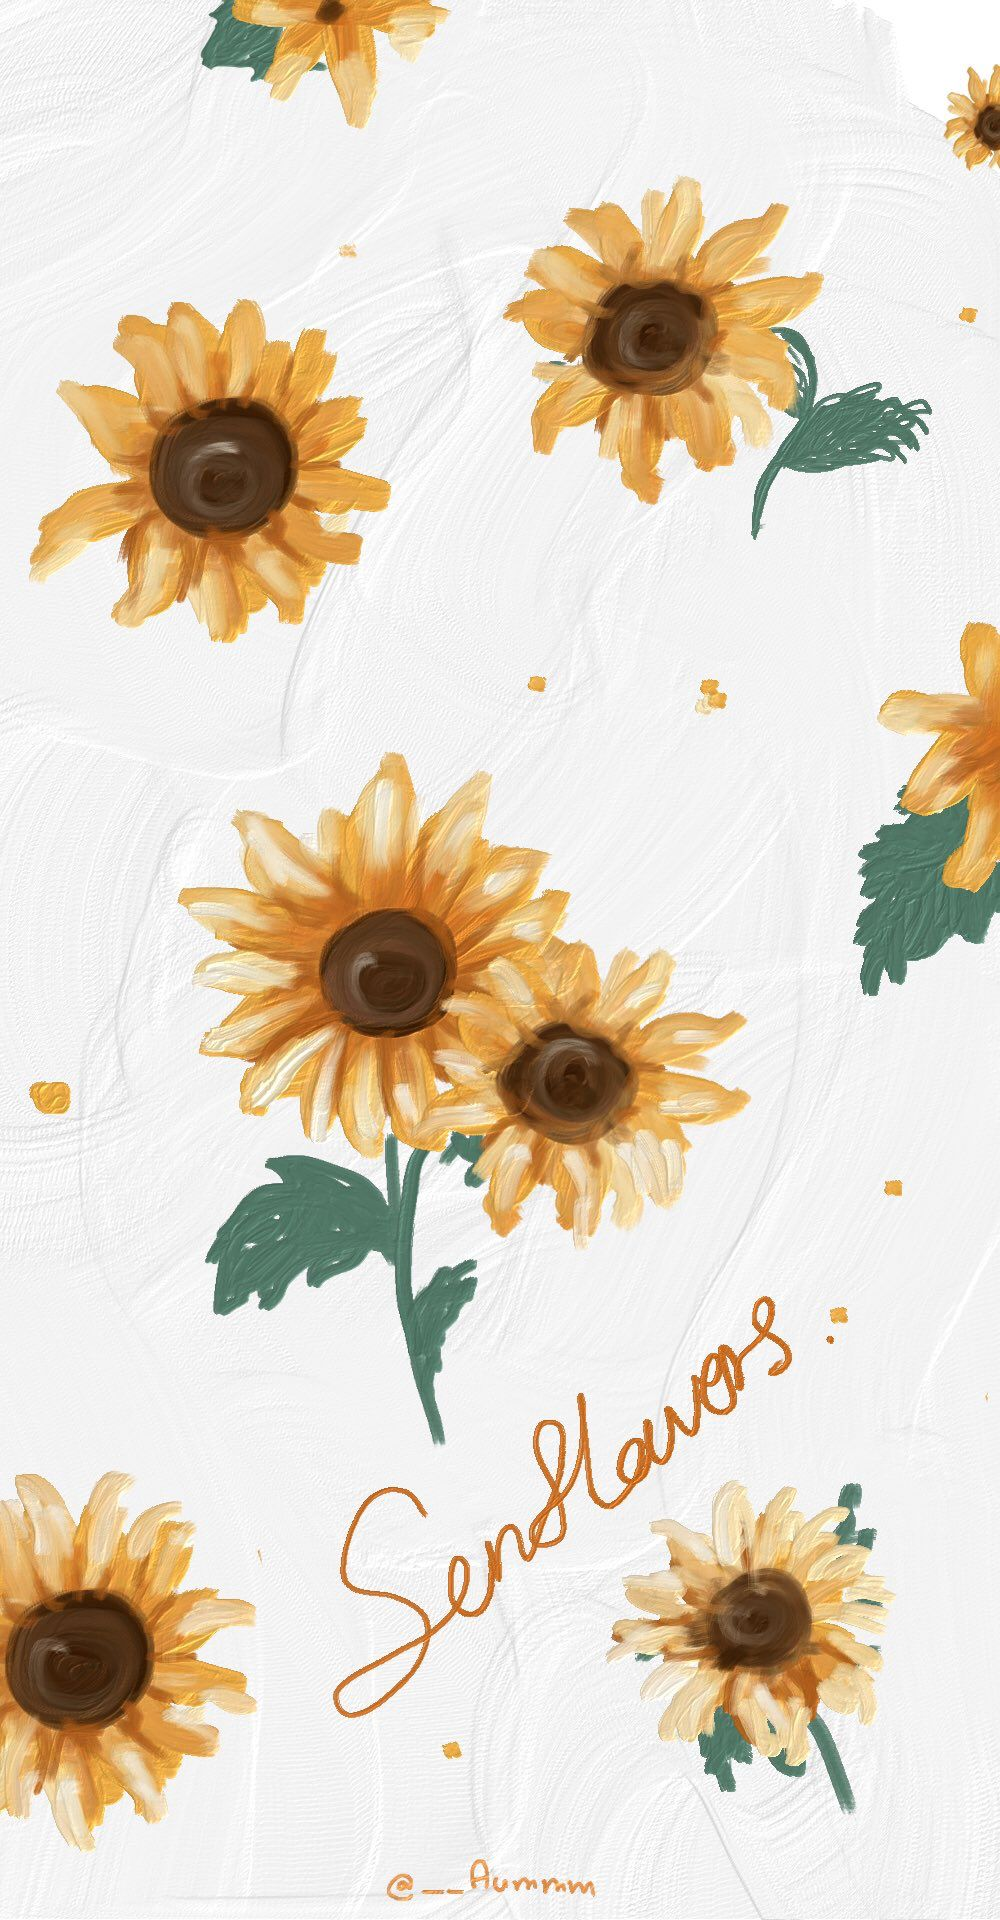 Pin Oleh Michell Cano Di Cute Wallpapers Seni Abstrak Ilustrasi Poster Ilustrasi